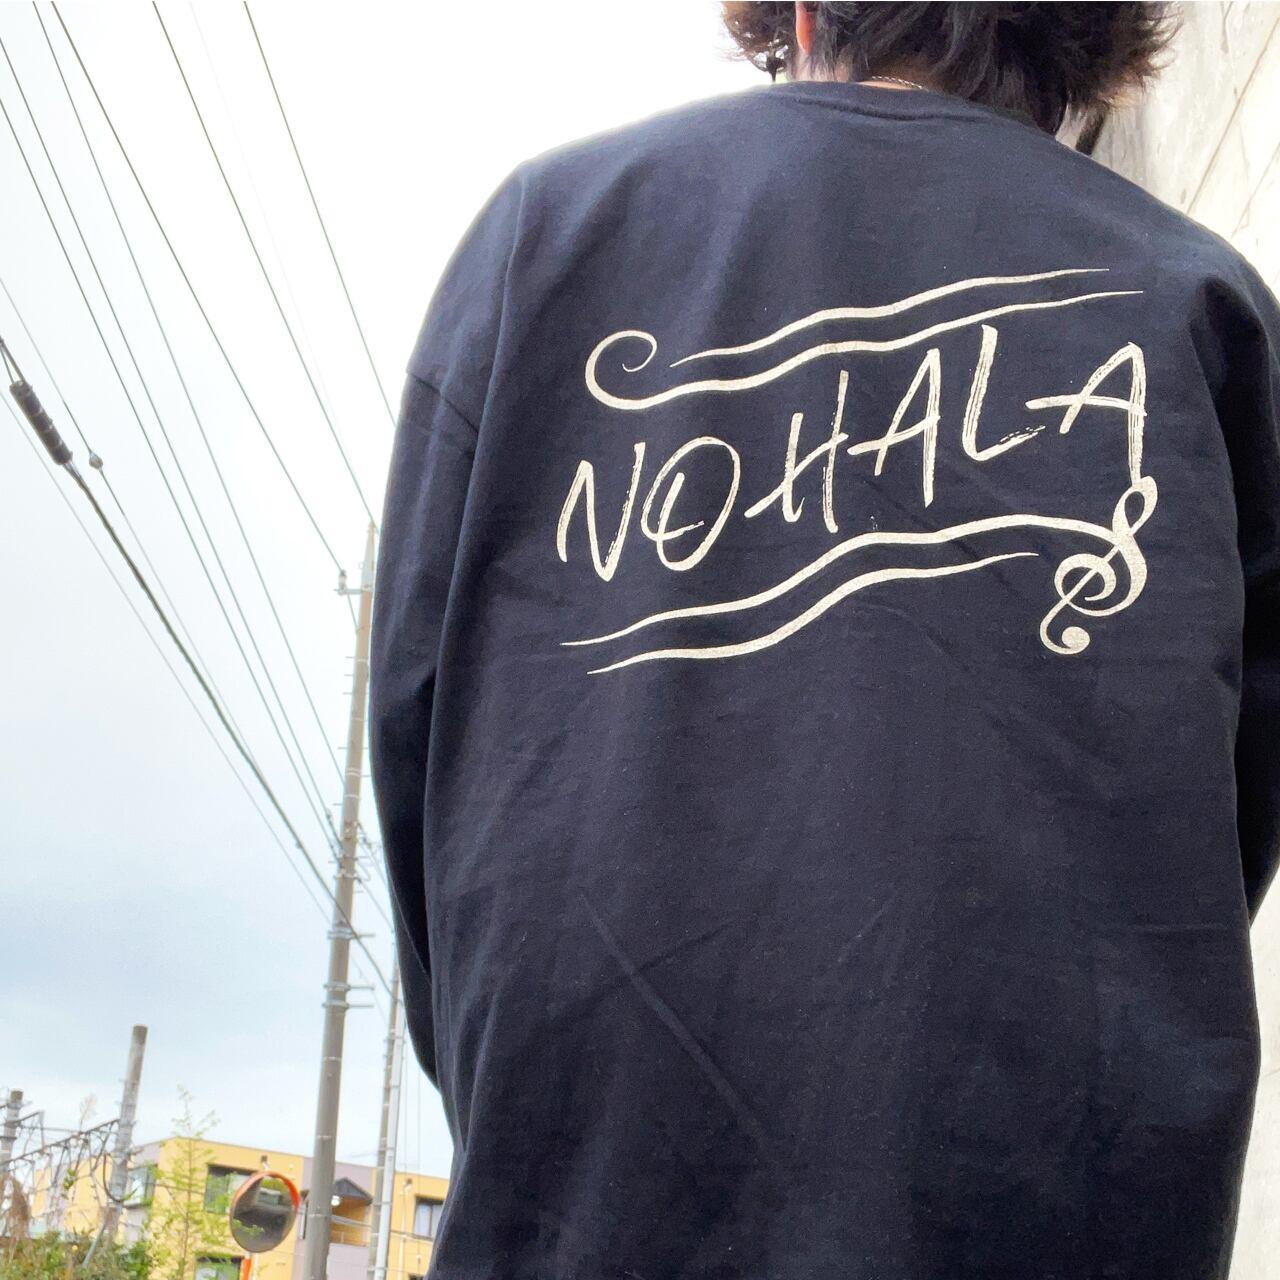 "【WillxWill × NOHALA】スペシャルコラボレーション ""Gentian"" Long Sleeve Black  + マニック LIVE STREAMING 映像 セット"